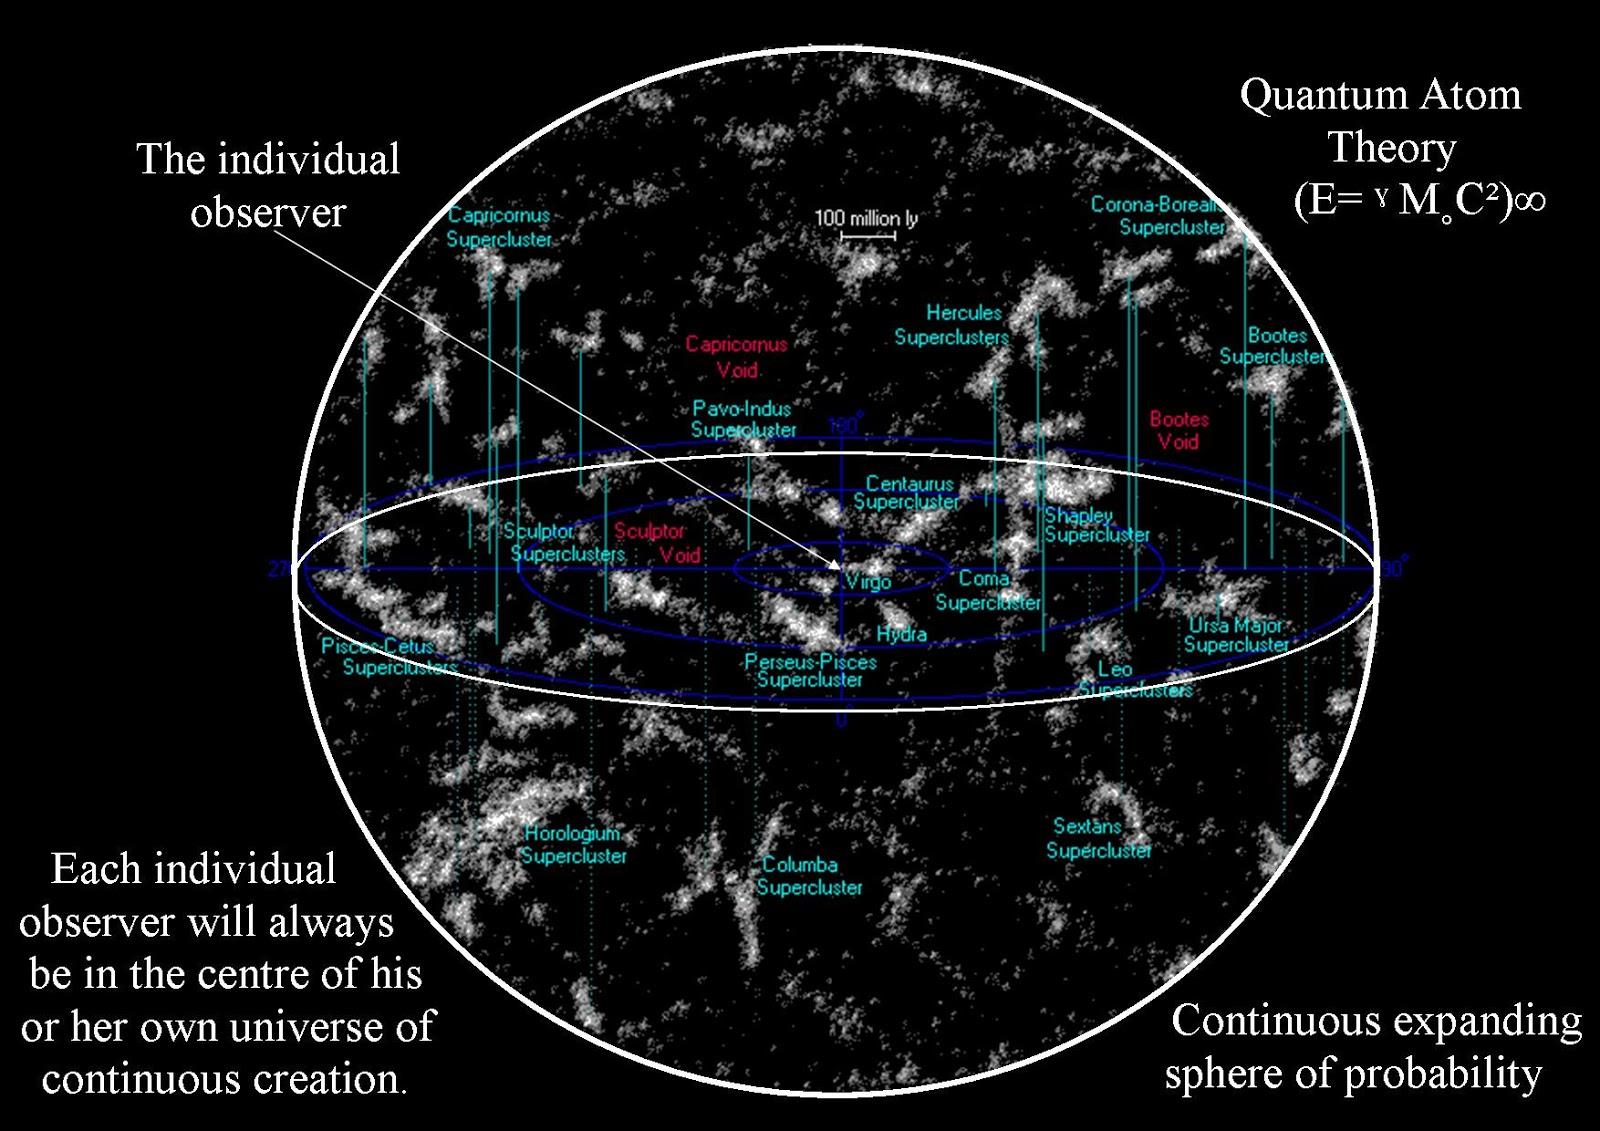 http://1.bp.blogspot.com/-GNAFt-scq_c/USIYfLLDN6I/AAAAAAAAFI4/nH2pBCYmSaQ/s1600/Supper+clusters+of+galaxies+2.jpg